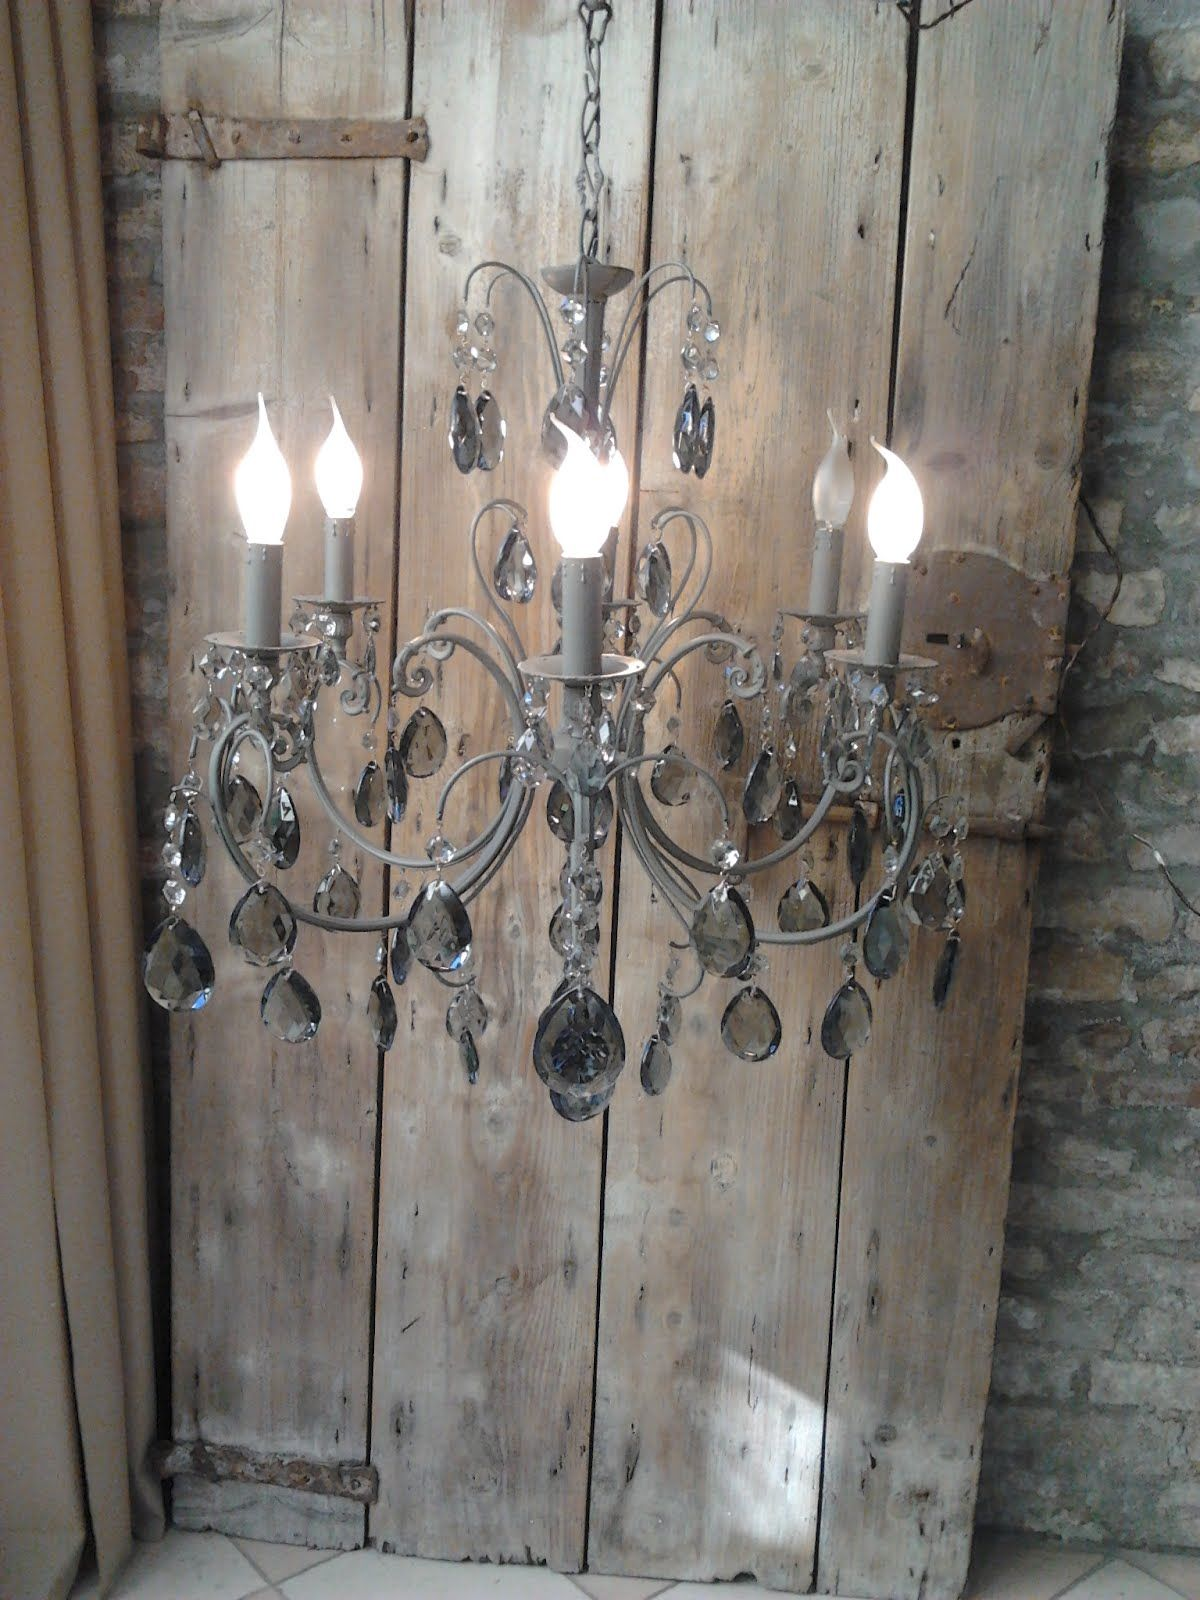 Lampadario gocce | luci | Pinterest | Lampadari, Lampade e Luci